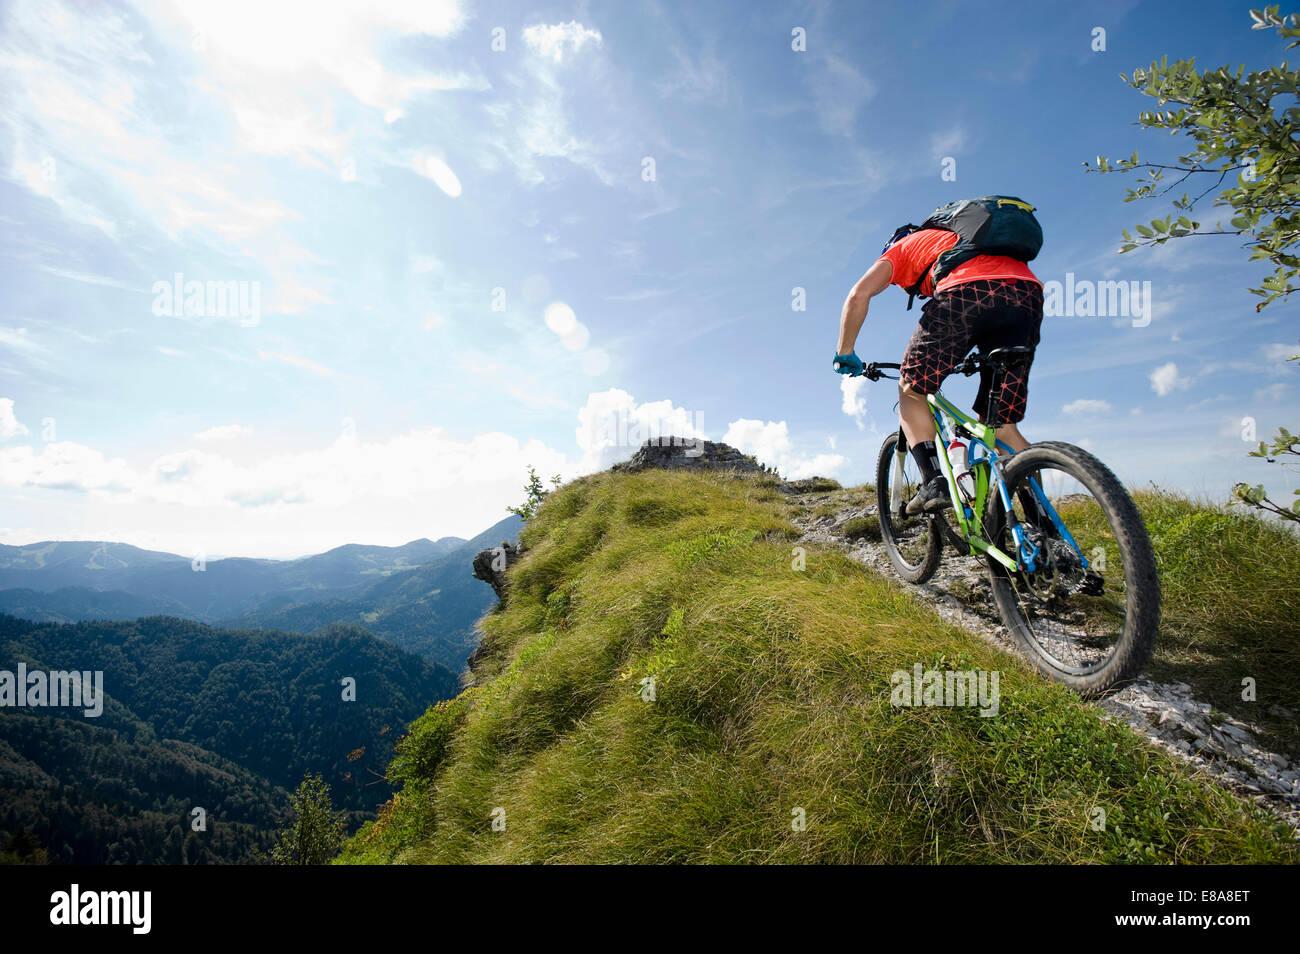 mountain biker on the way uphill, Slatnik, Istria, Slovenia - Stock Image